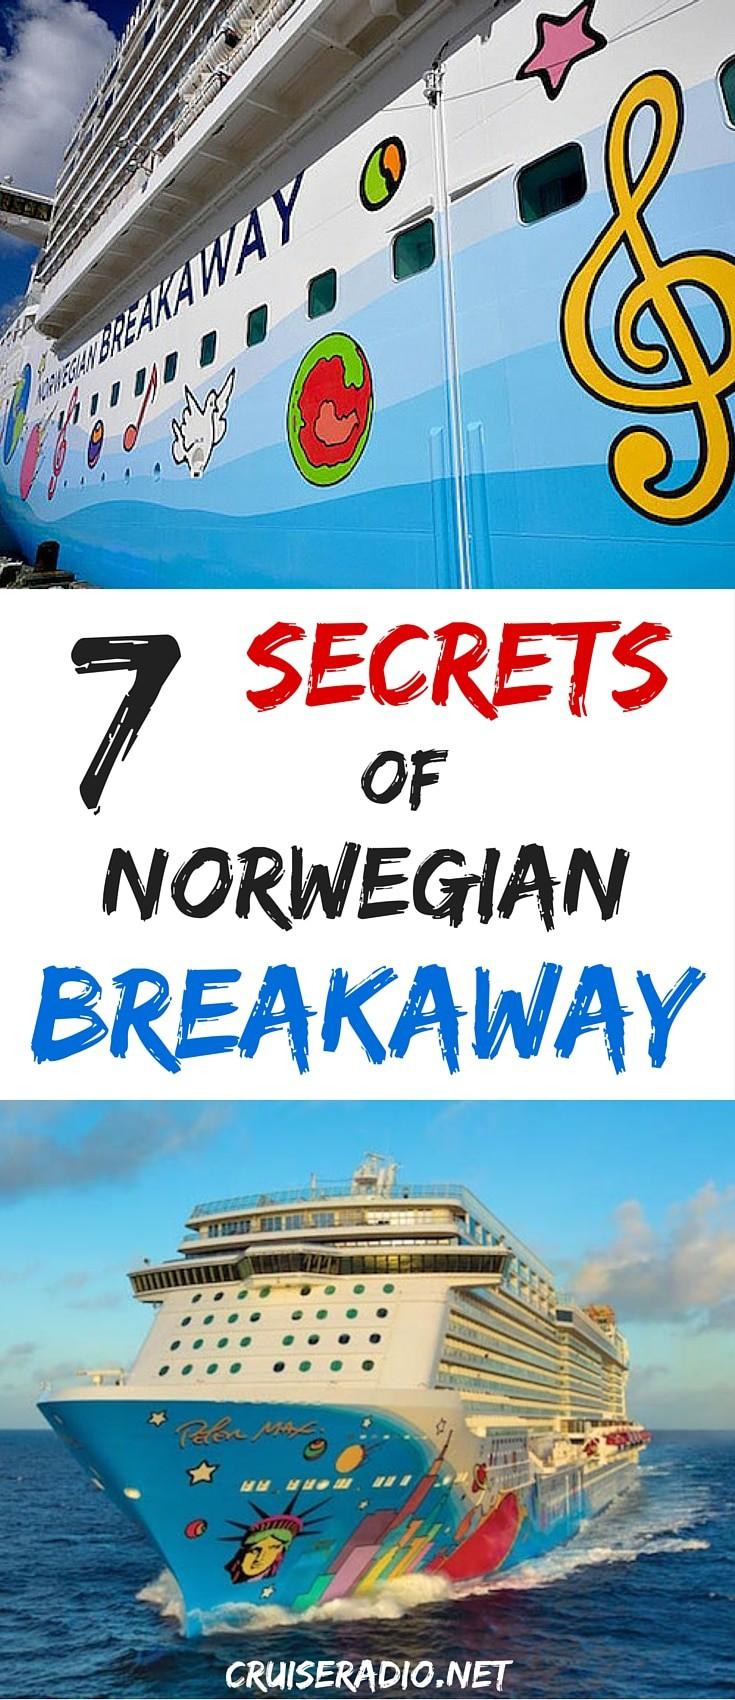 #breakaway #norwegianbreakaway #breakaway #cruise #travel